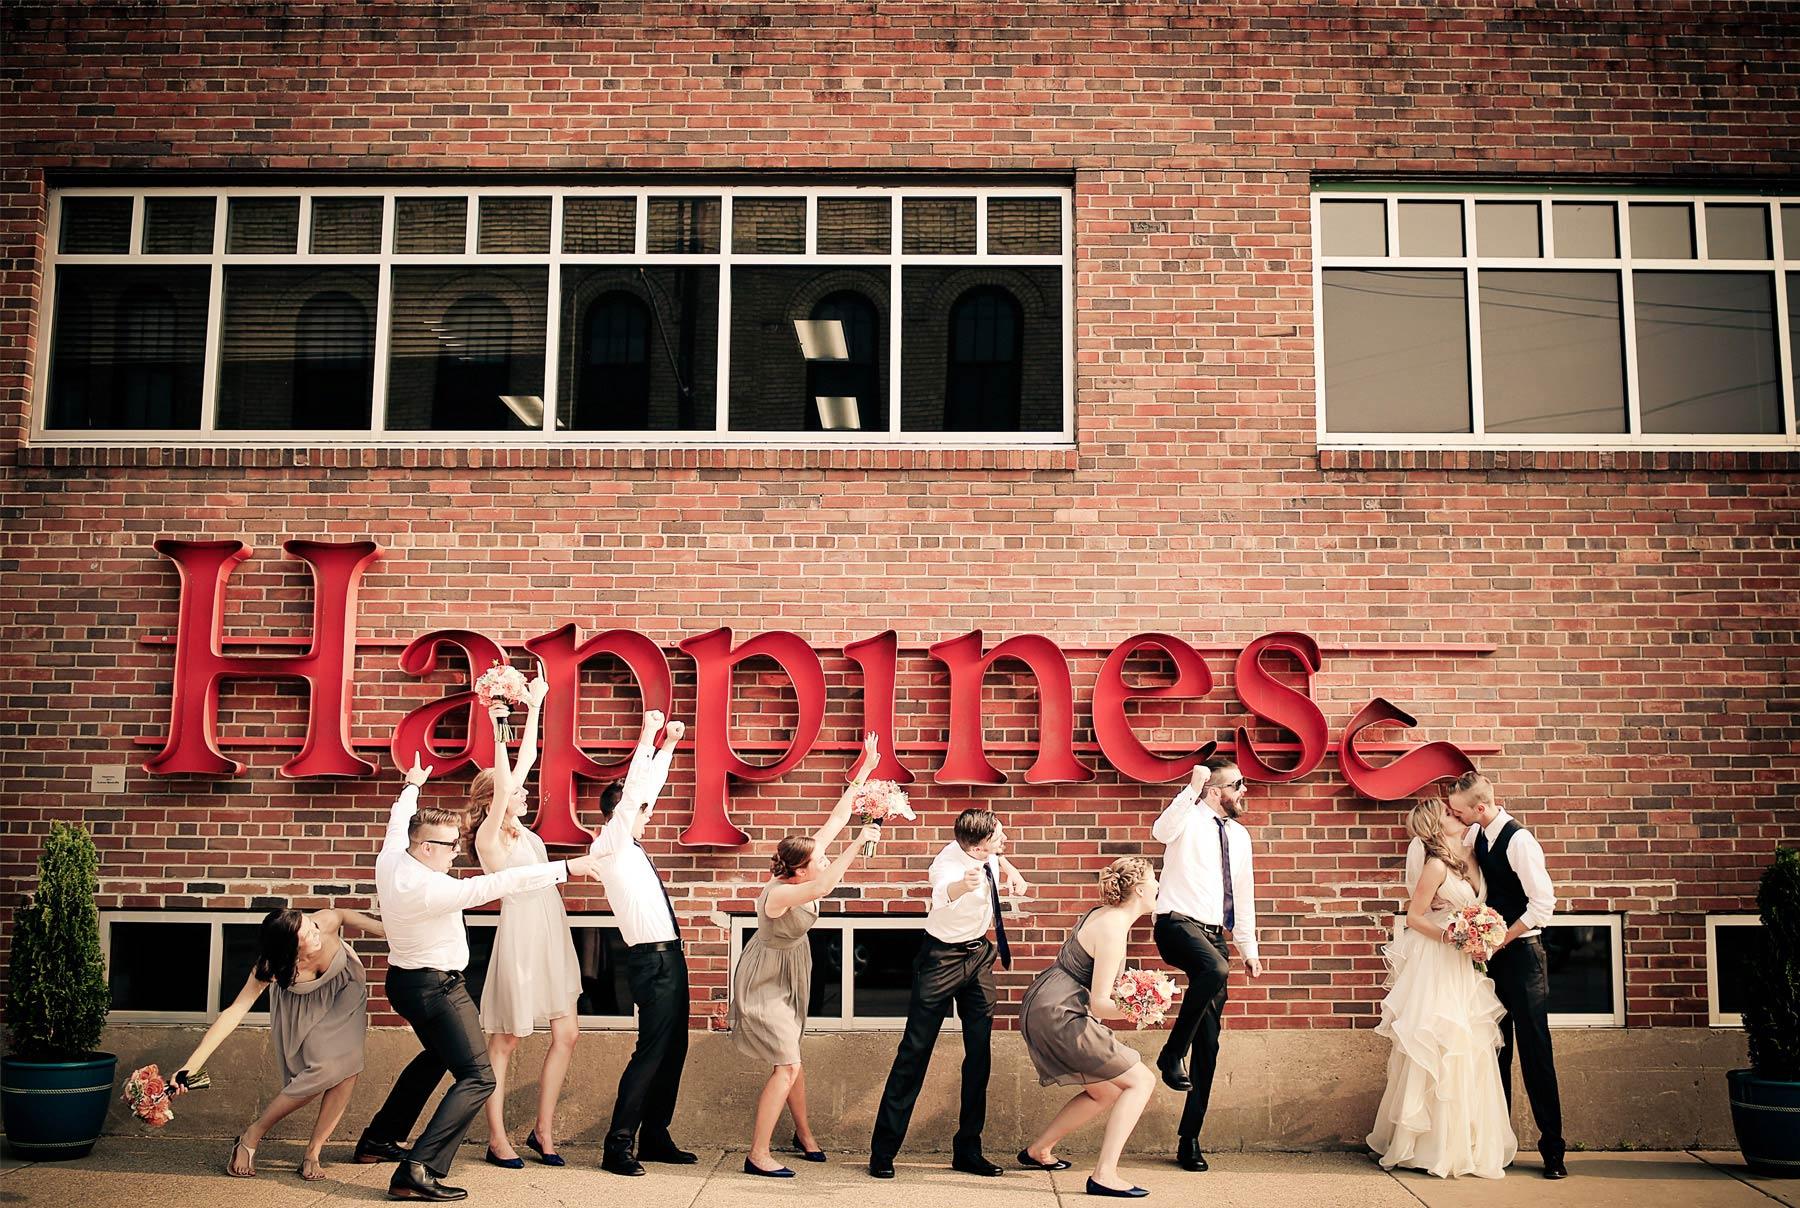 10-Minneapolis-Minnesota-Wedding-Photography-by-Vick-Photography-Wedding-Party-Group-Happiness-Jess-&-Jake.jpg